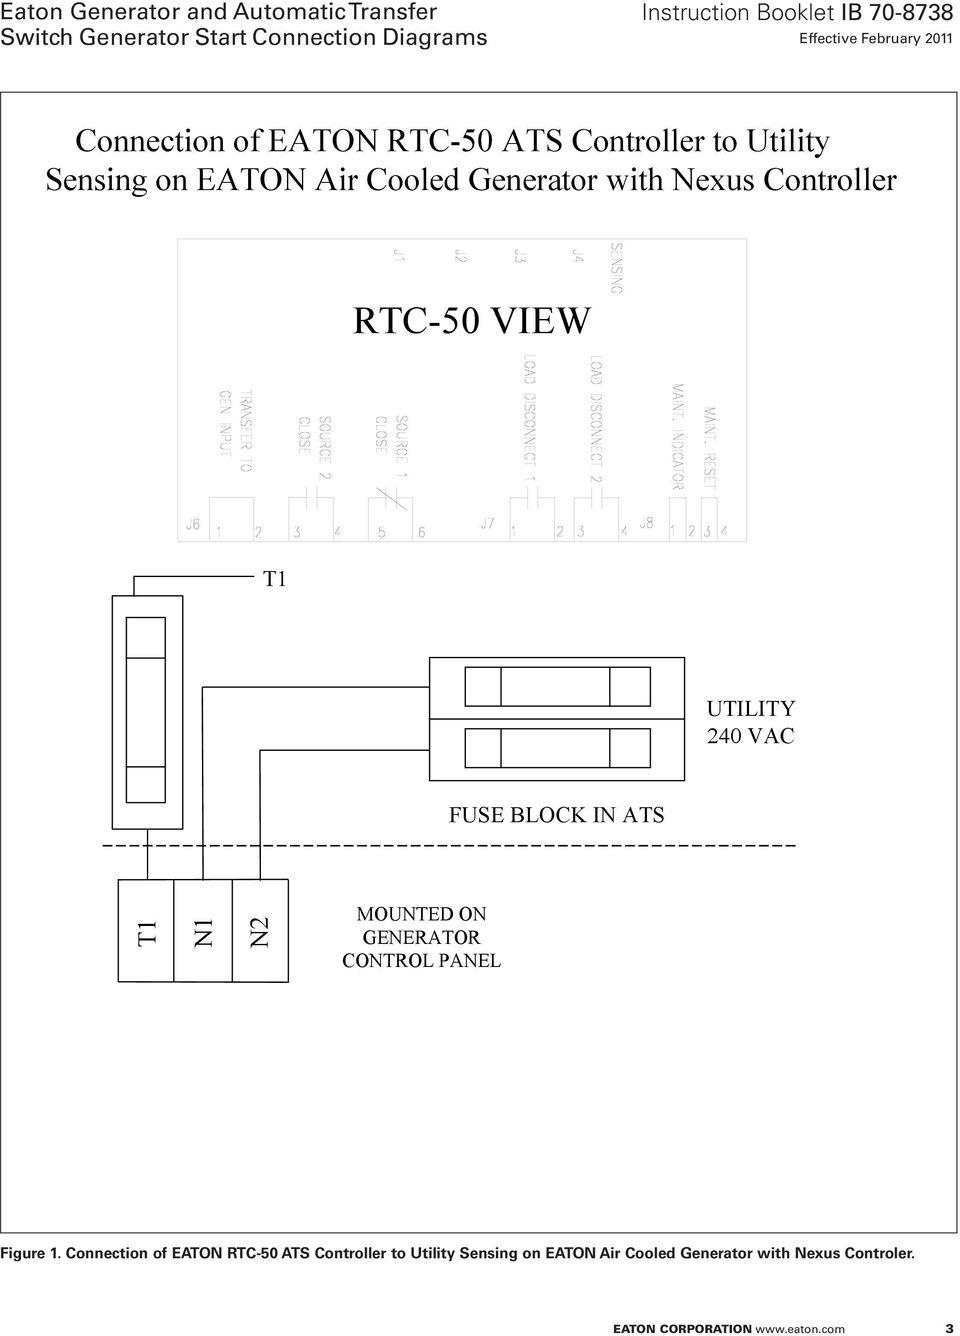 Pincor Generator Wiring Diagram Electrical Diagrams Nexus Marketing Positioning Manual Amusing Olympian Contemporary